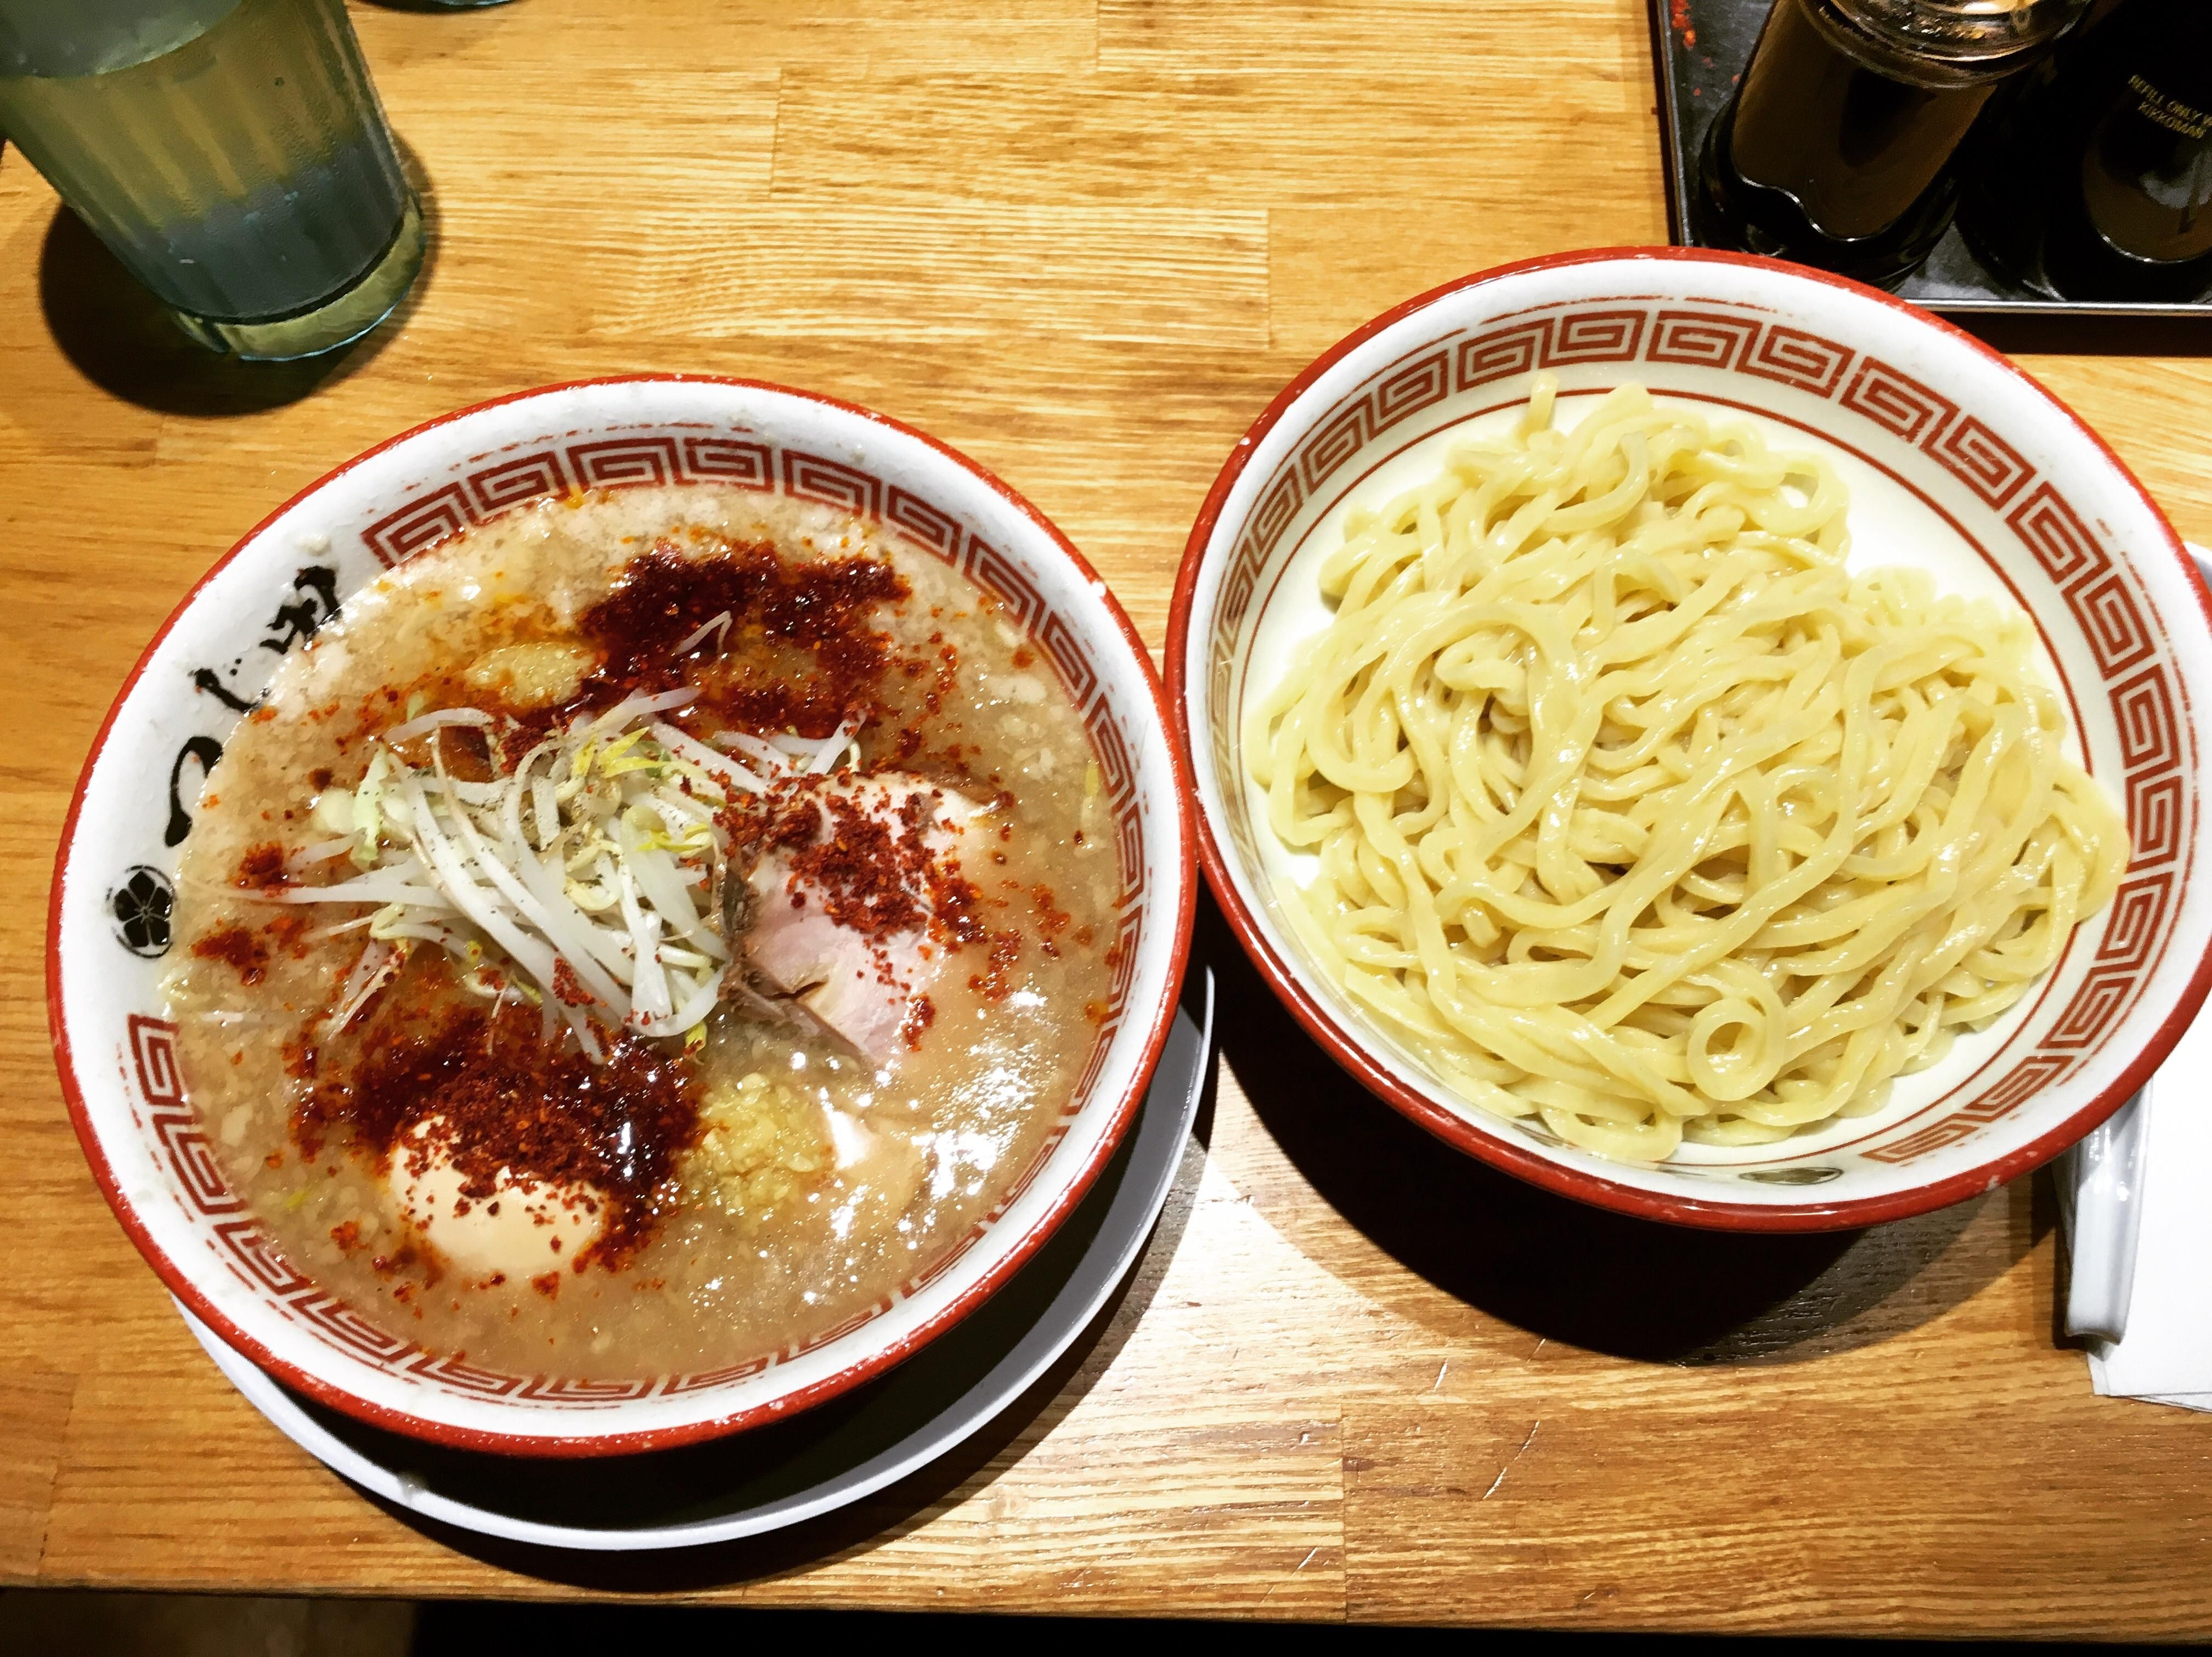 I Ate Tsukemen Ramen Recipes Food Cooking Delicious Foodie